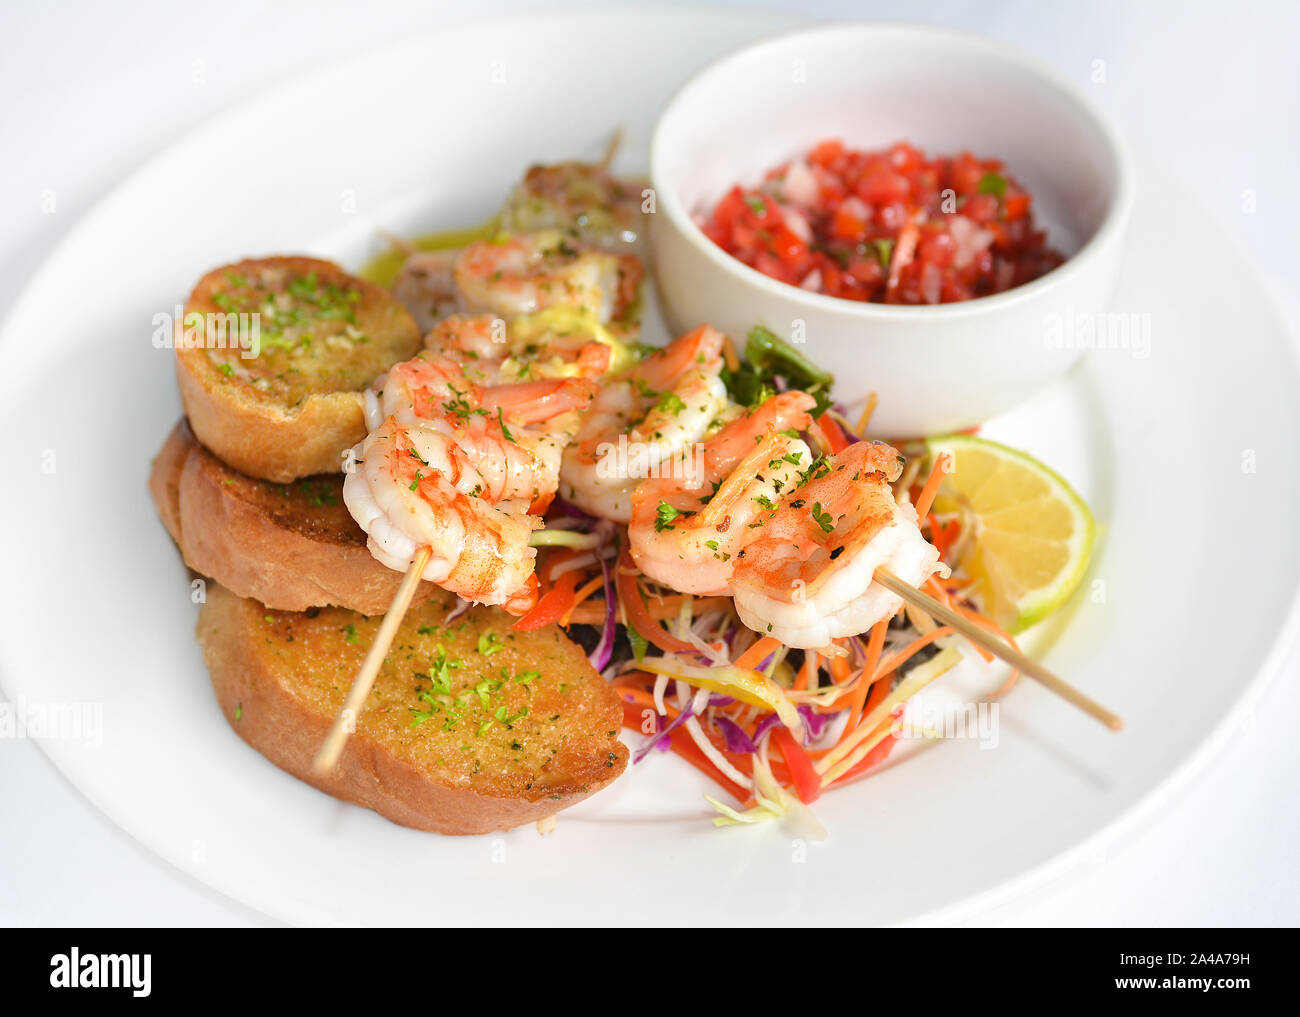 Continental Cuisine Restaurant Menu Food Photography Menu Photos Stock Photo Alamy